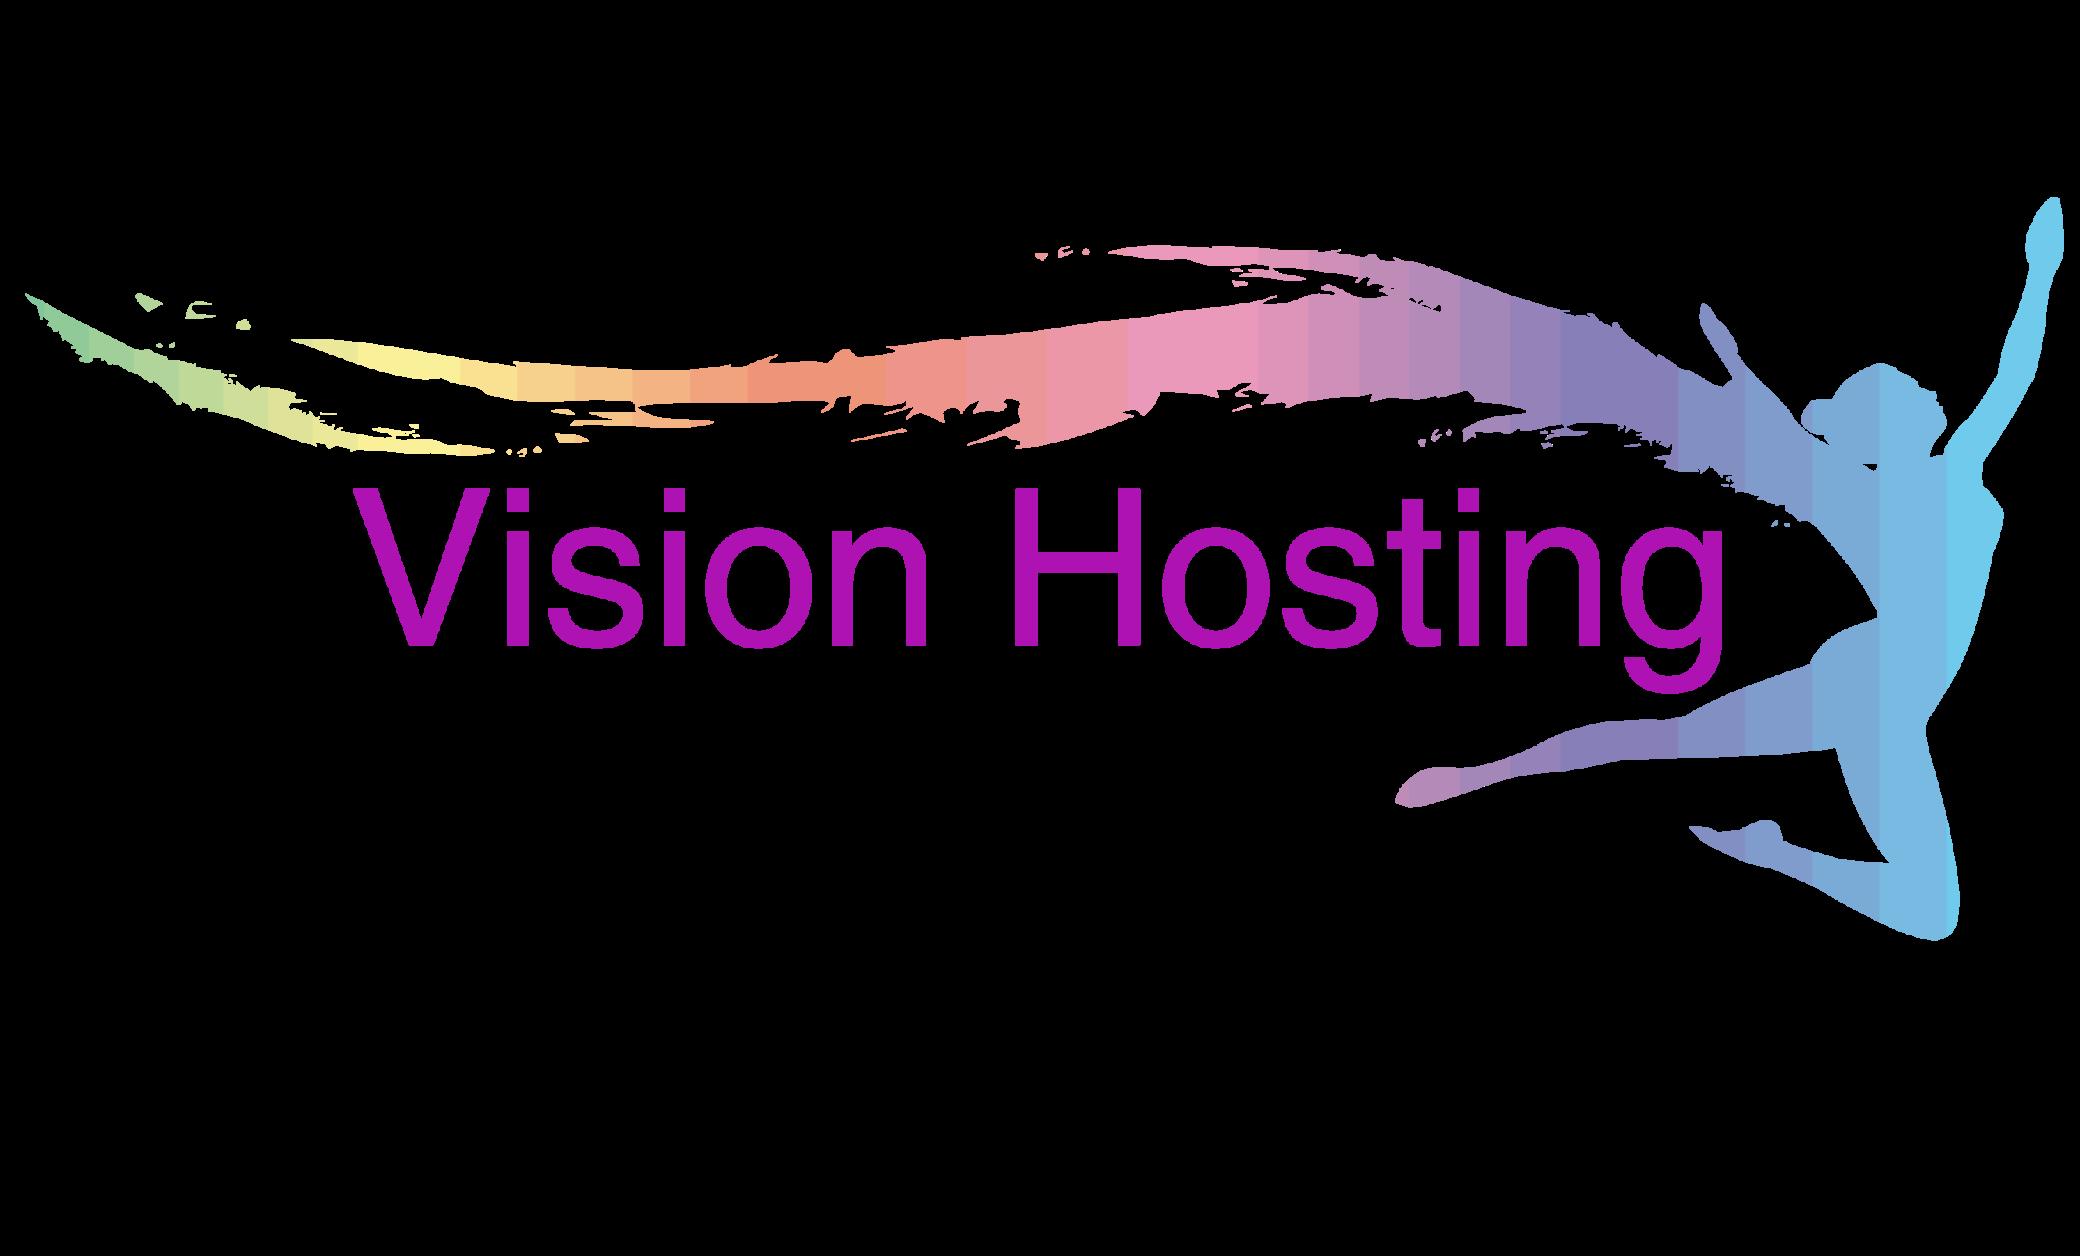 Vision Hosting